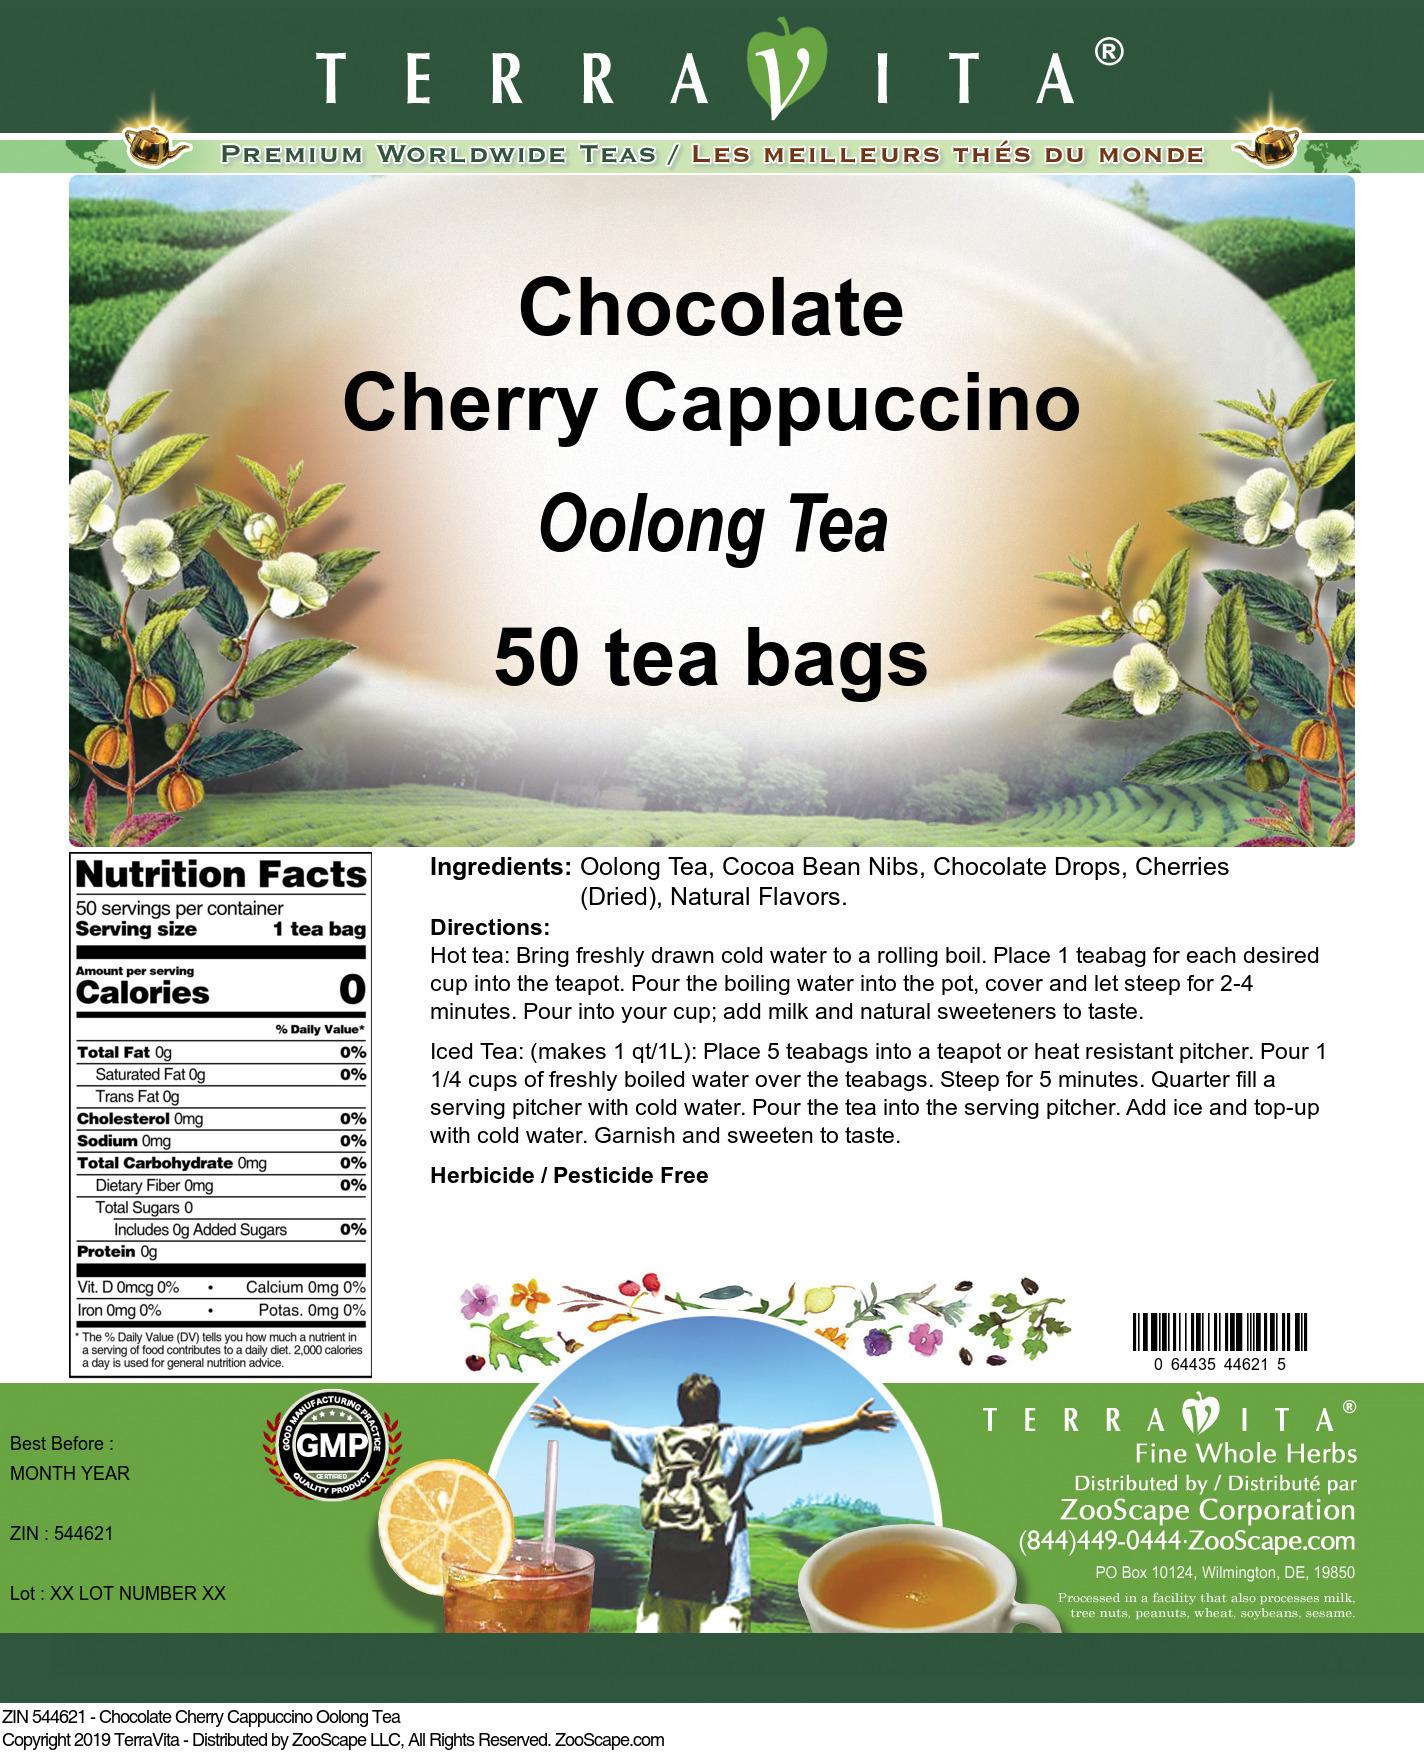 Chocolate Cherry Cappuccino Oolong Tea